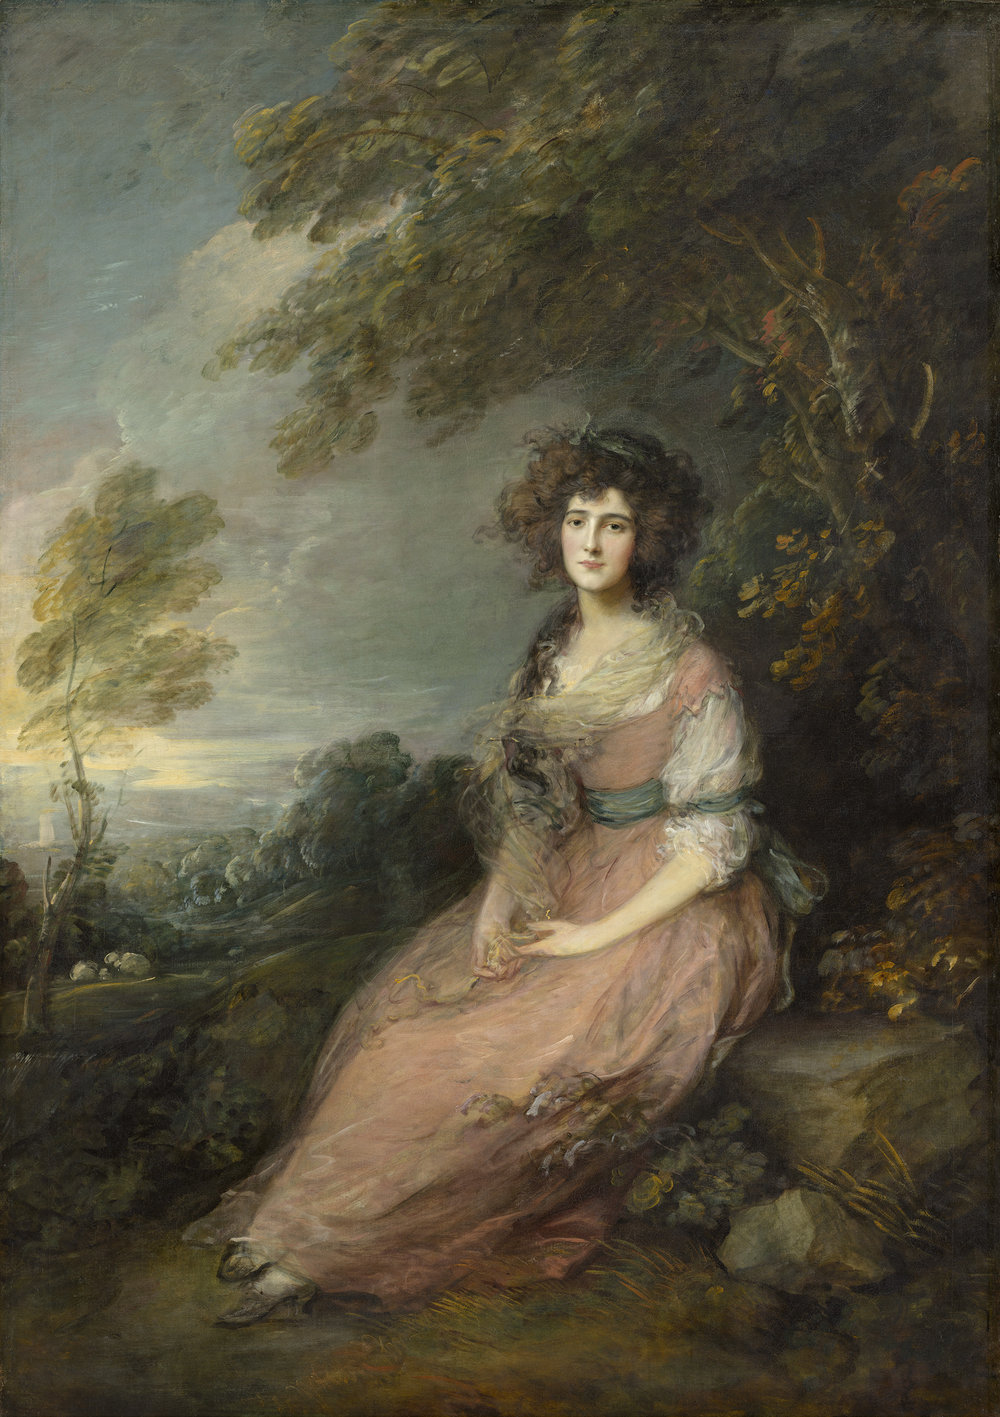 Mrs Richard Brinsley Sheridan, 1787, Thomas Gainsborough